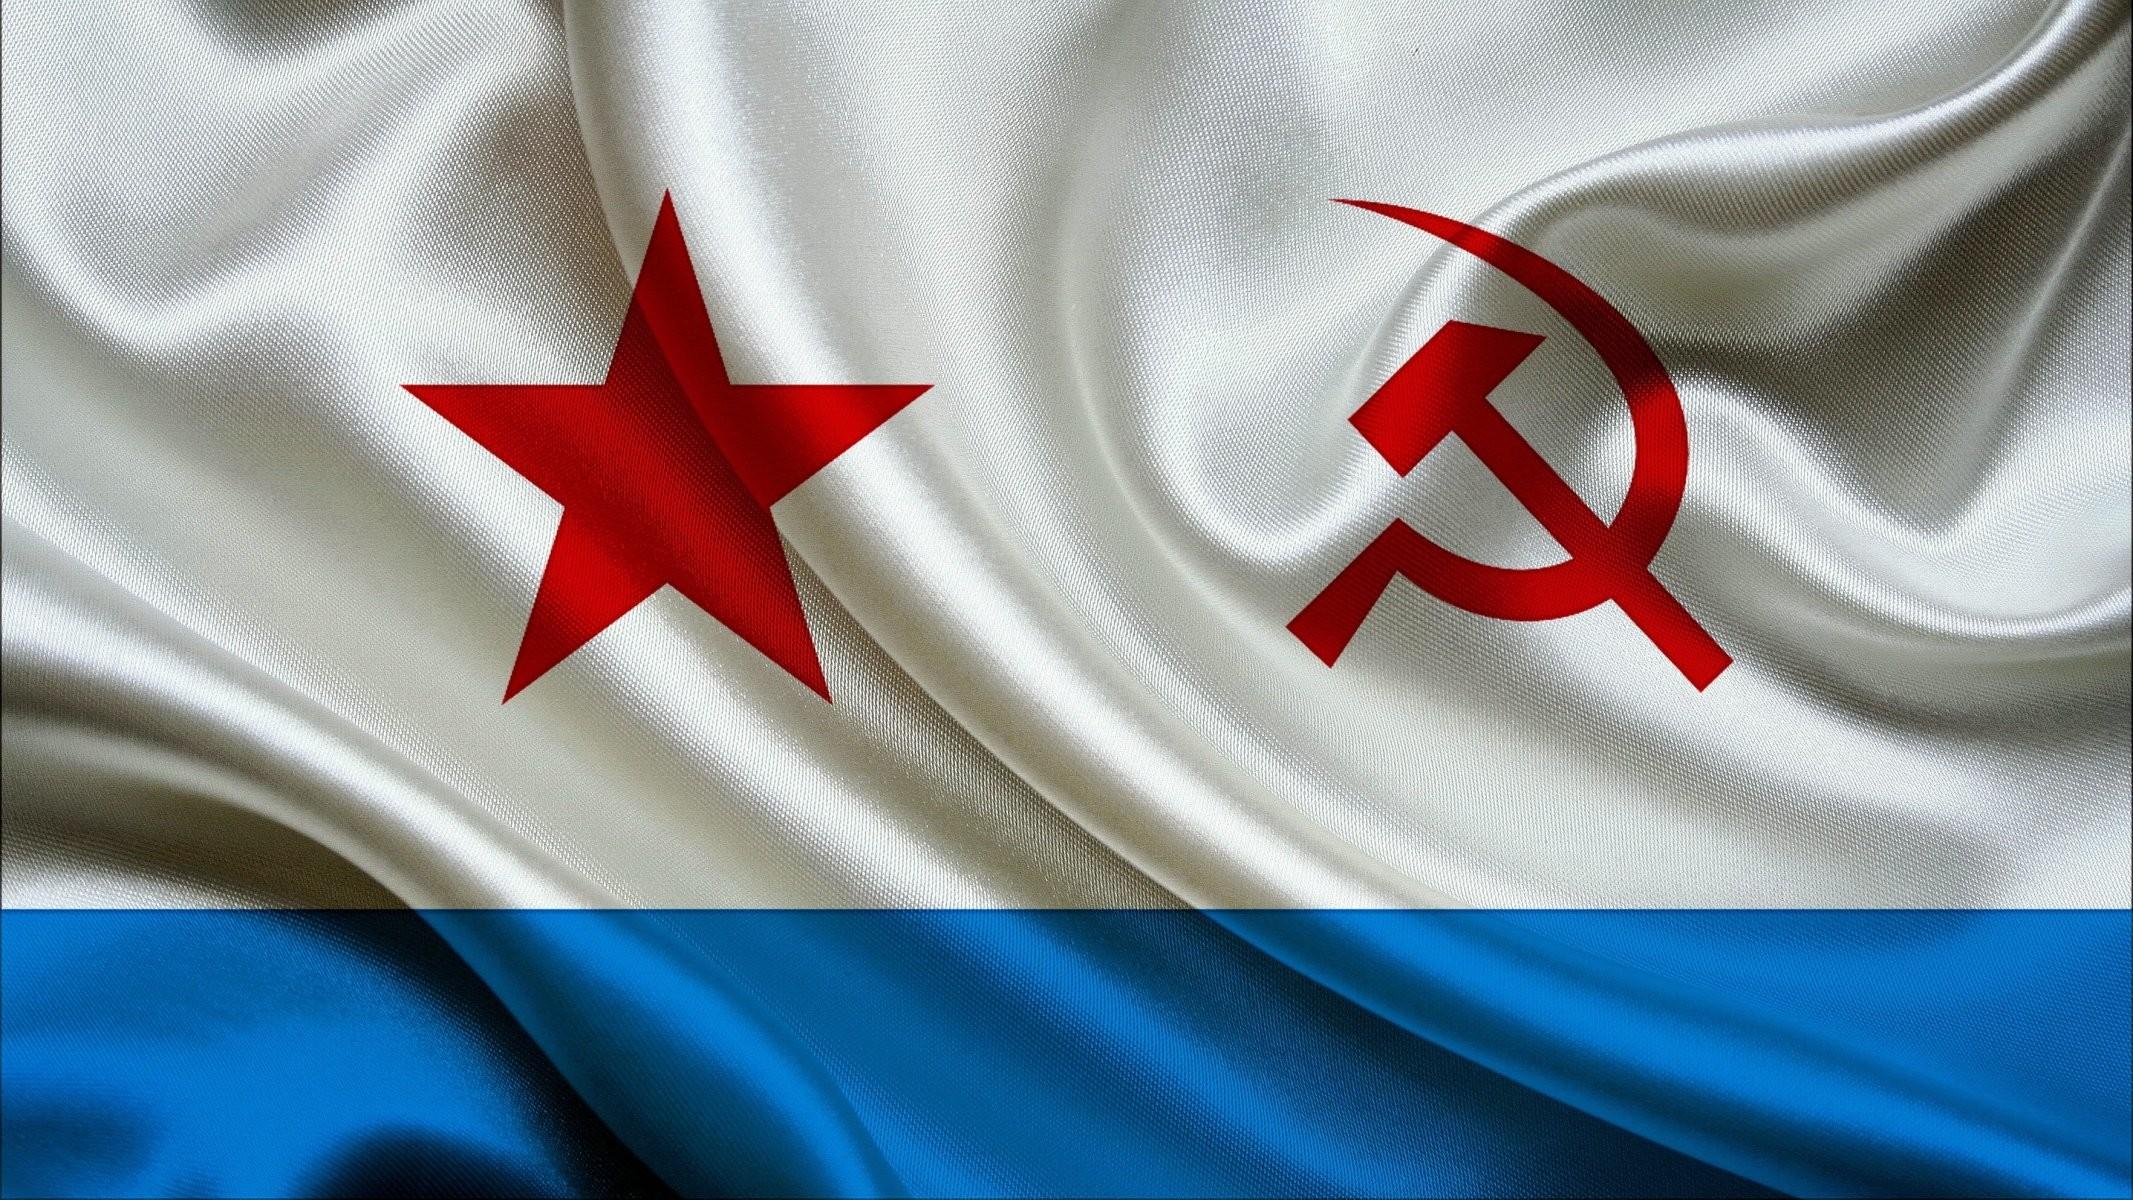 flag navy naval forces soviet union flag ussr background wallpaper . …